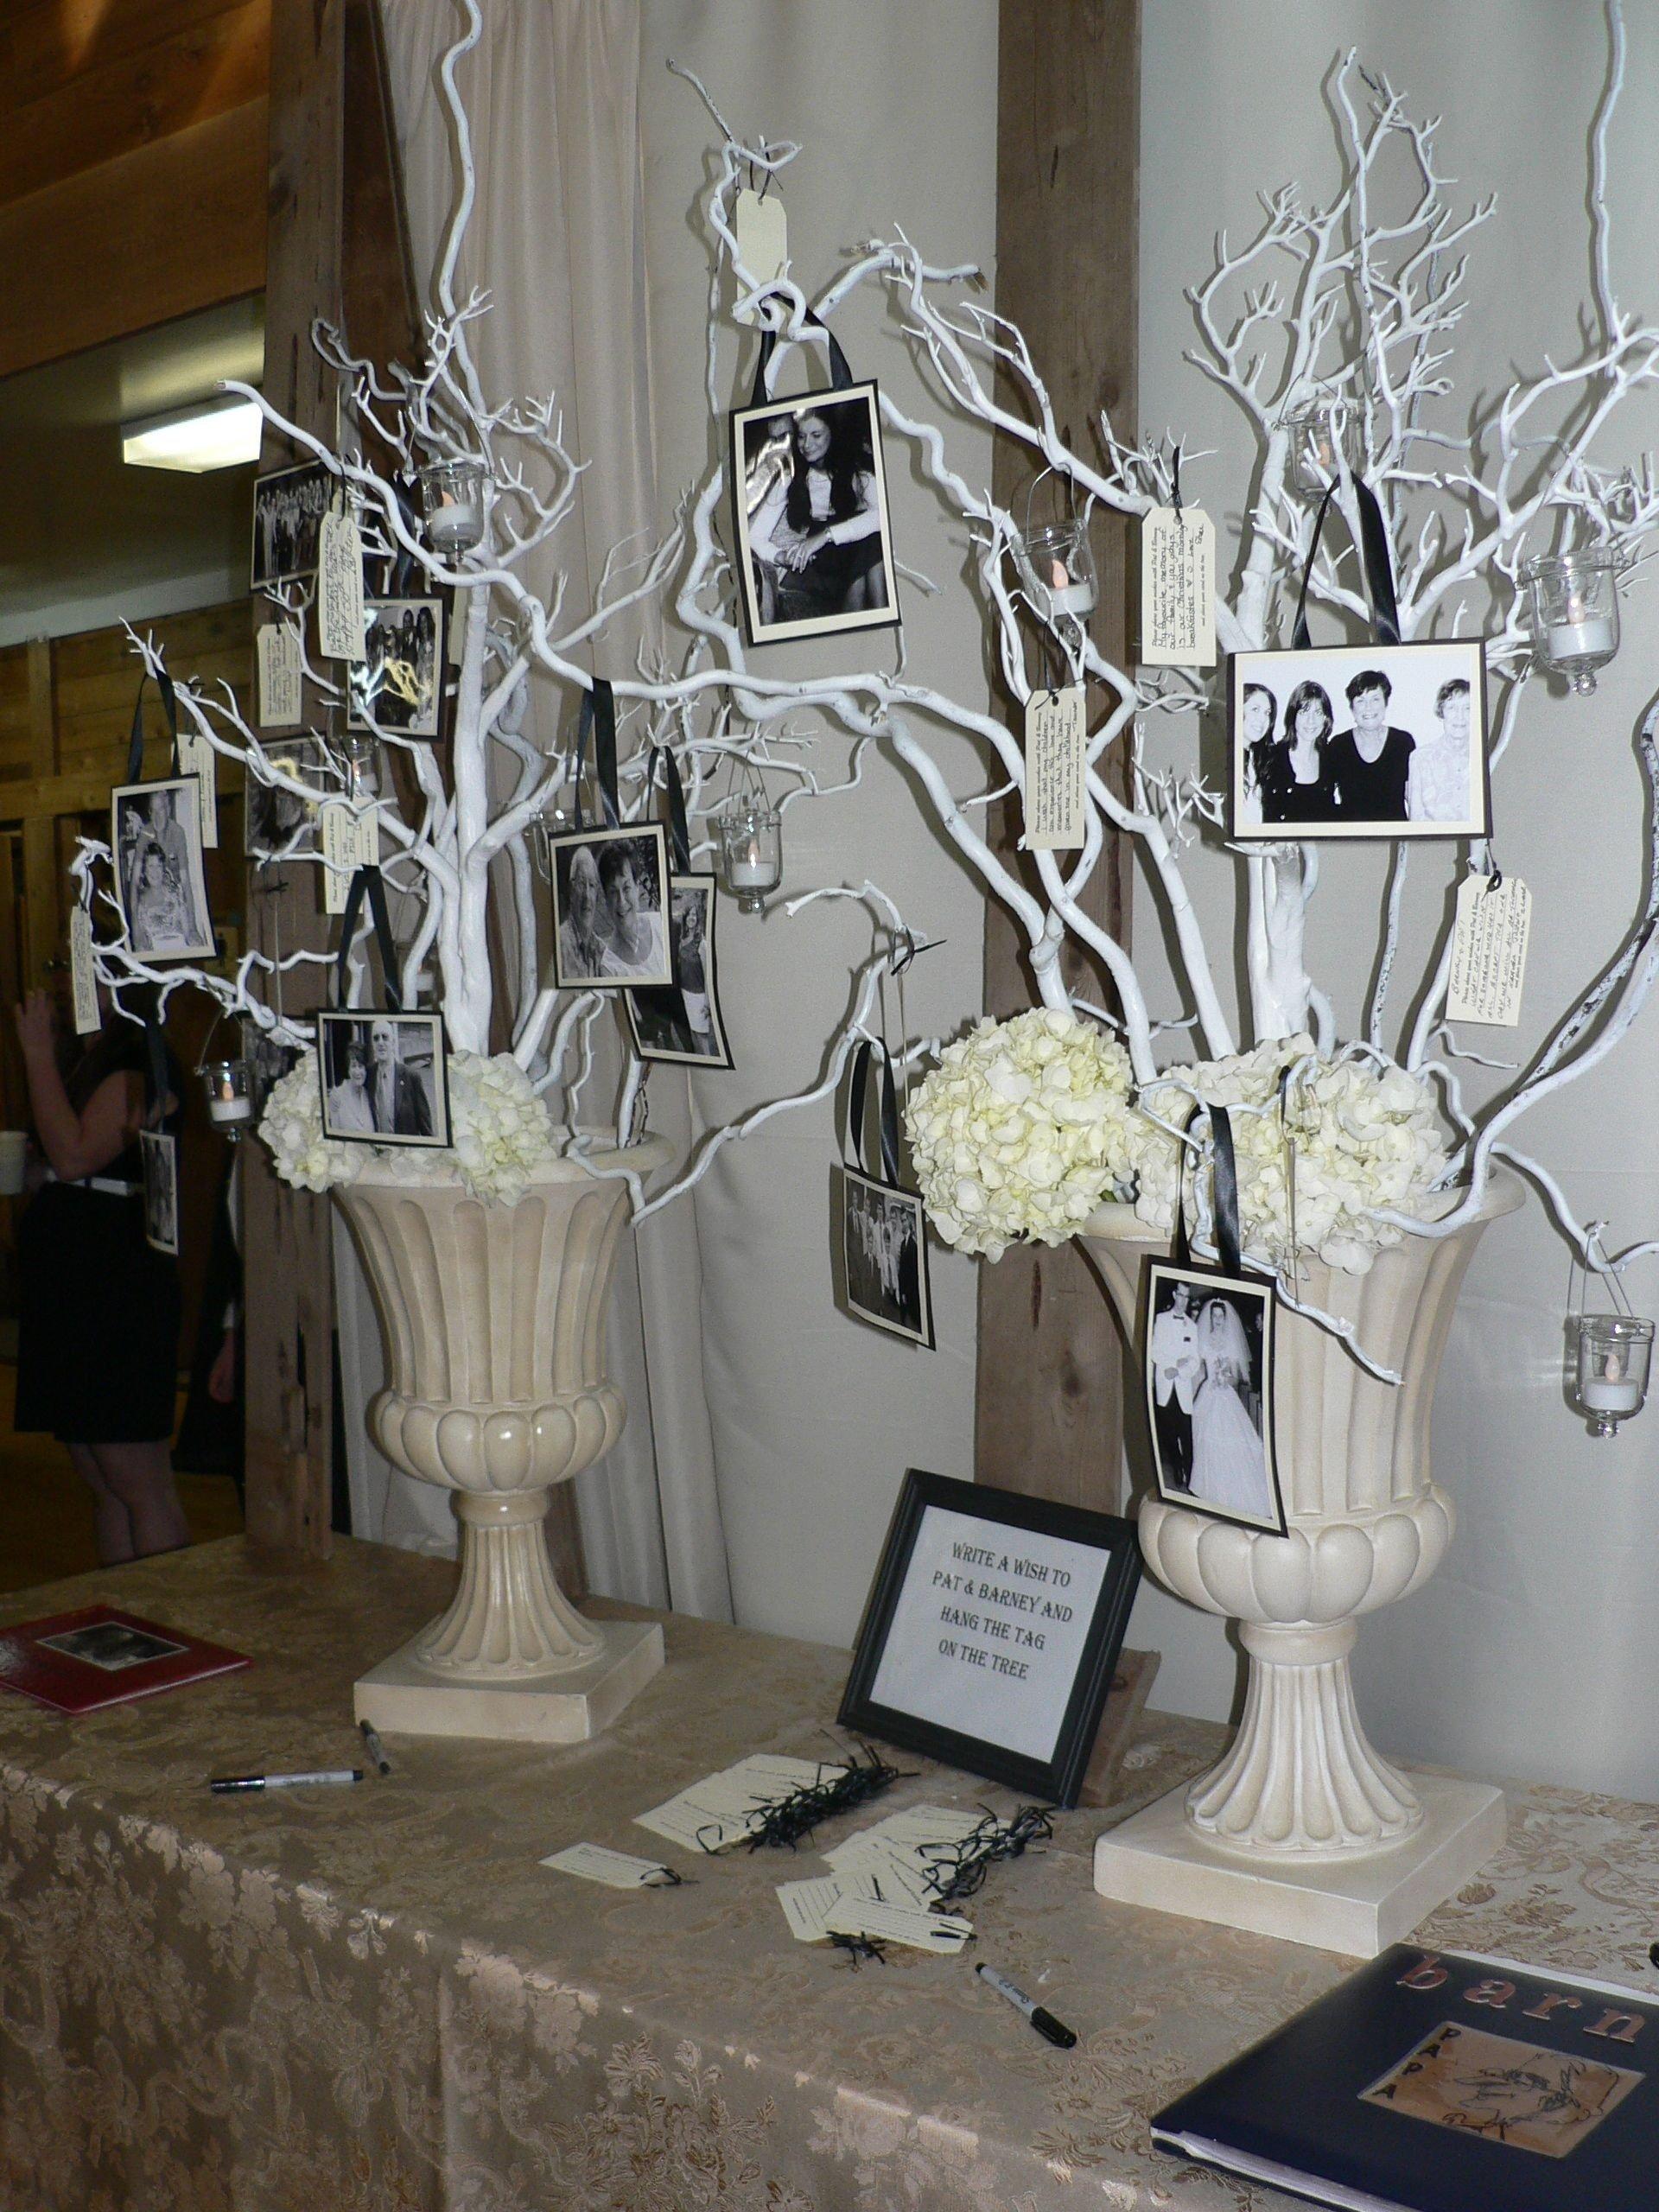 10 Wonderful Wedding Anniversary Ideas On A Budget 50th anniversary party ideas on a budget 50th anniversary at 2 2020